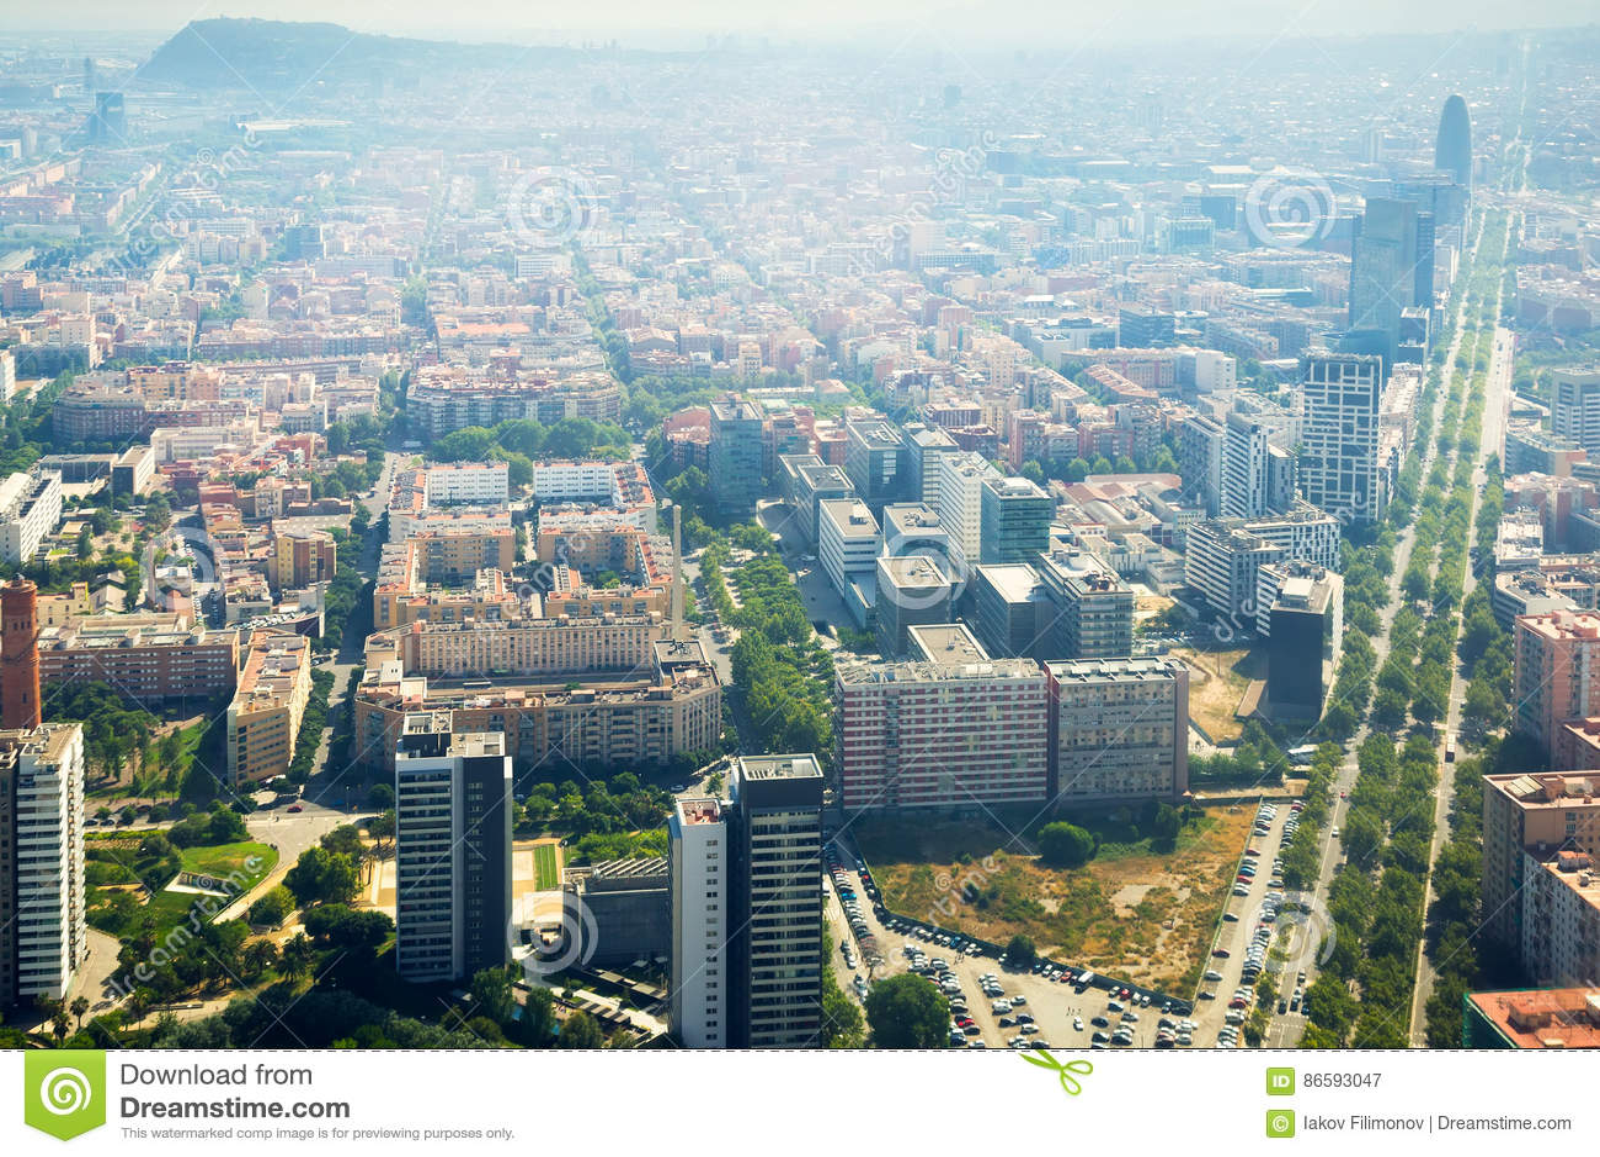 Modern neighbourhoods of Barcelona in Spain, aerial view